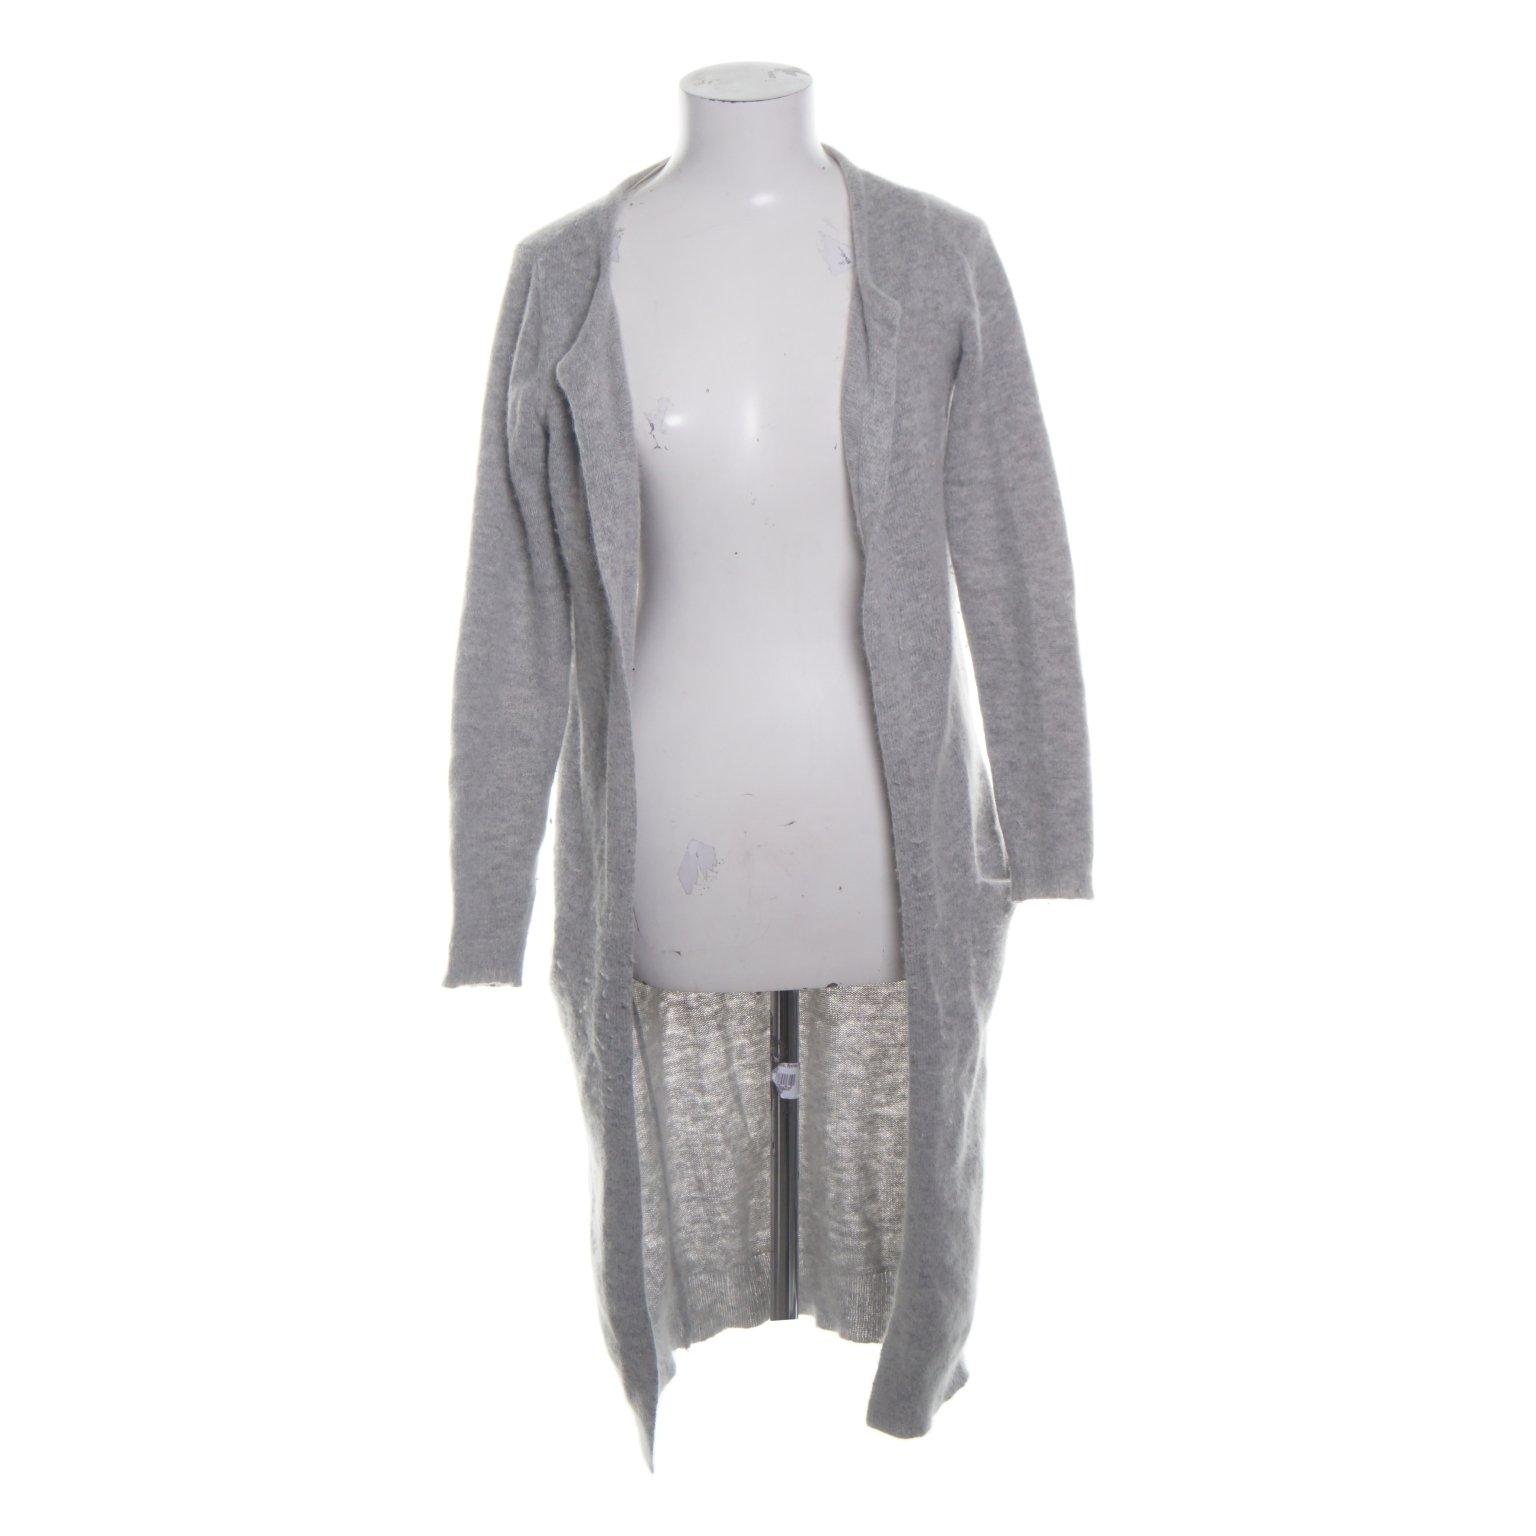 VILA Clothes, Kofta, Strl: XS, Kimber Long Knit Cardigan, Grå